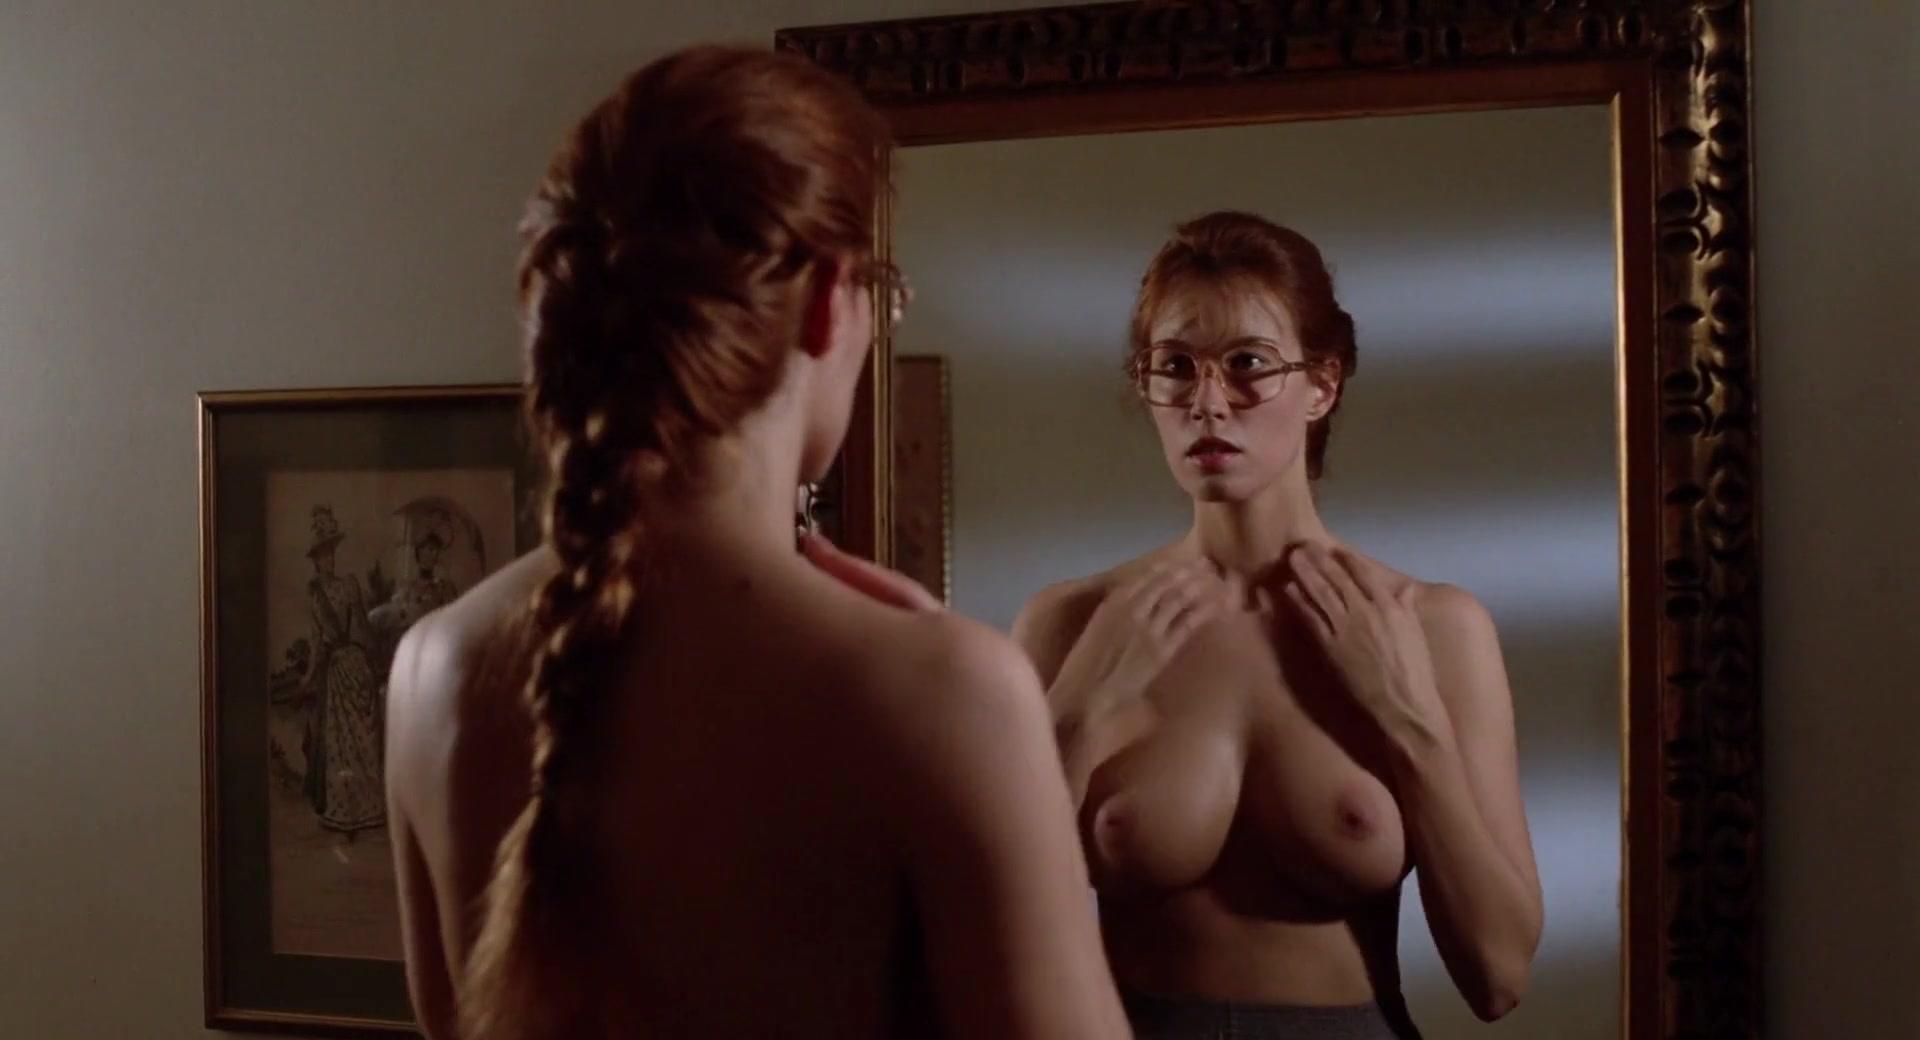 Hots Hd Celebrity Nude Videos Pics